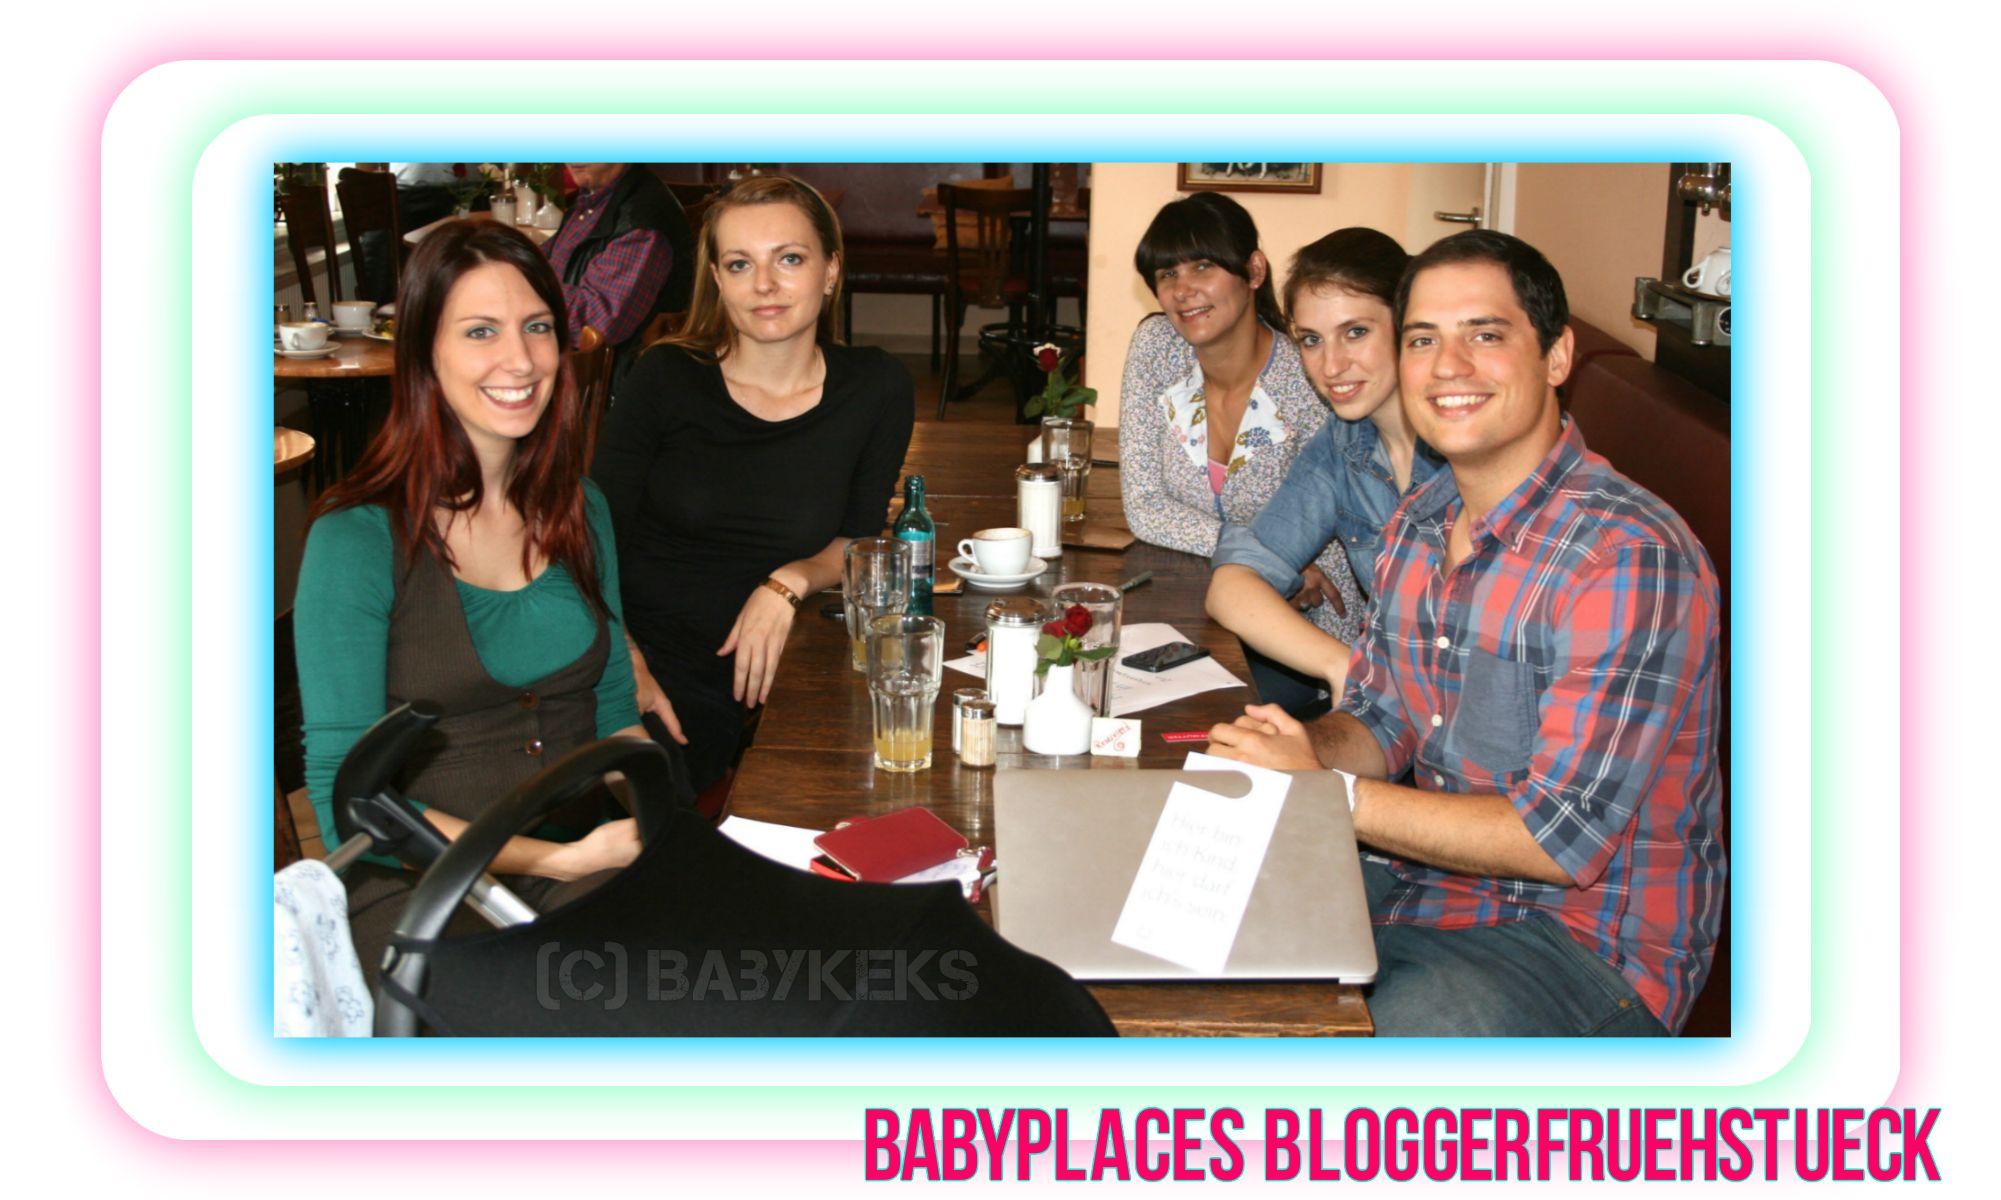 Babykeks_Blog_BloggerfrühstückBabyplaces.jpg